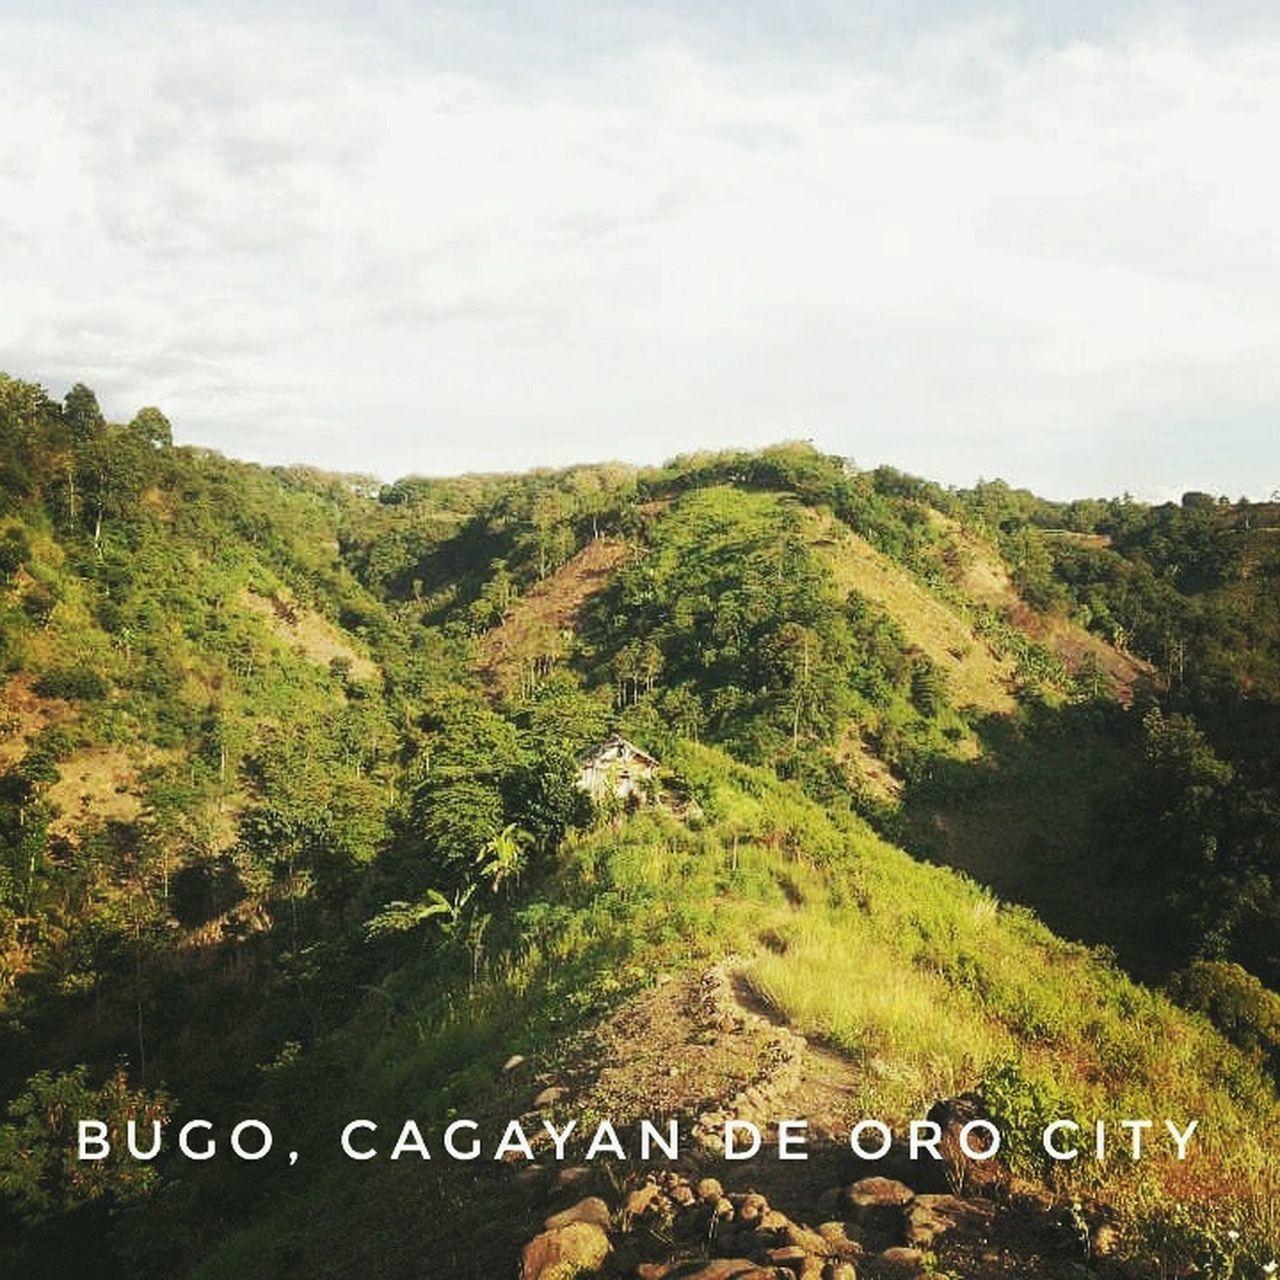 Landscape Outdoors GalaxyS7Edge Scenics Cagayan De Oro City. Philippines ❤️